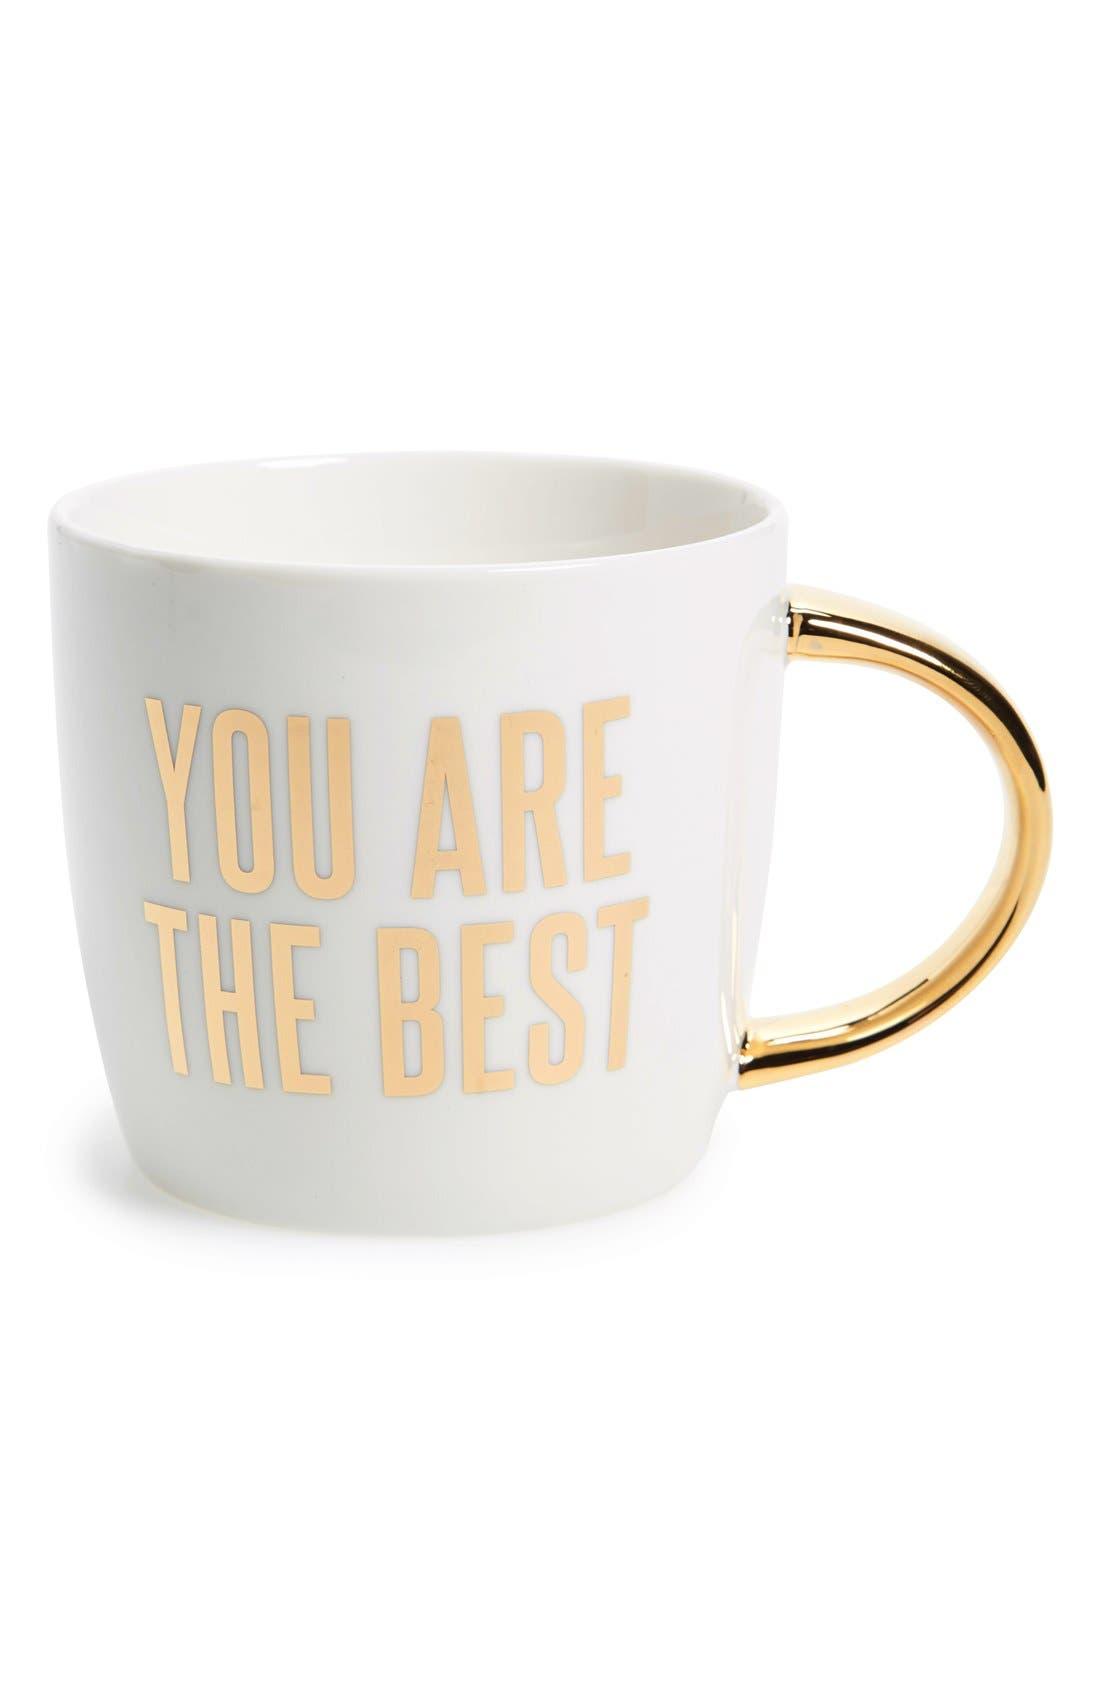 'You Are the Best' Ceramic Mug,                         Main,                         color, White